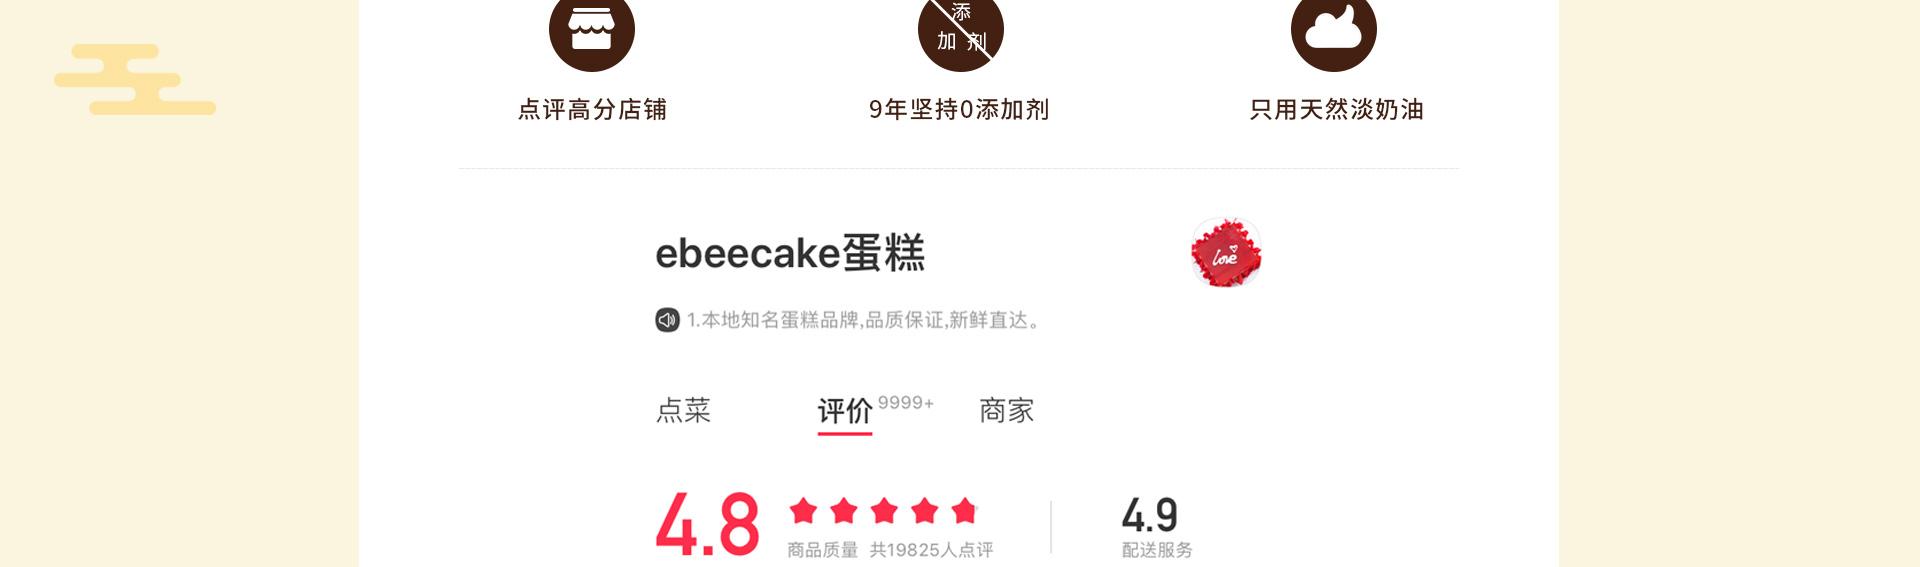 ebeecake小蜜蜂蛋糕 点评高分店铺